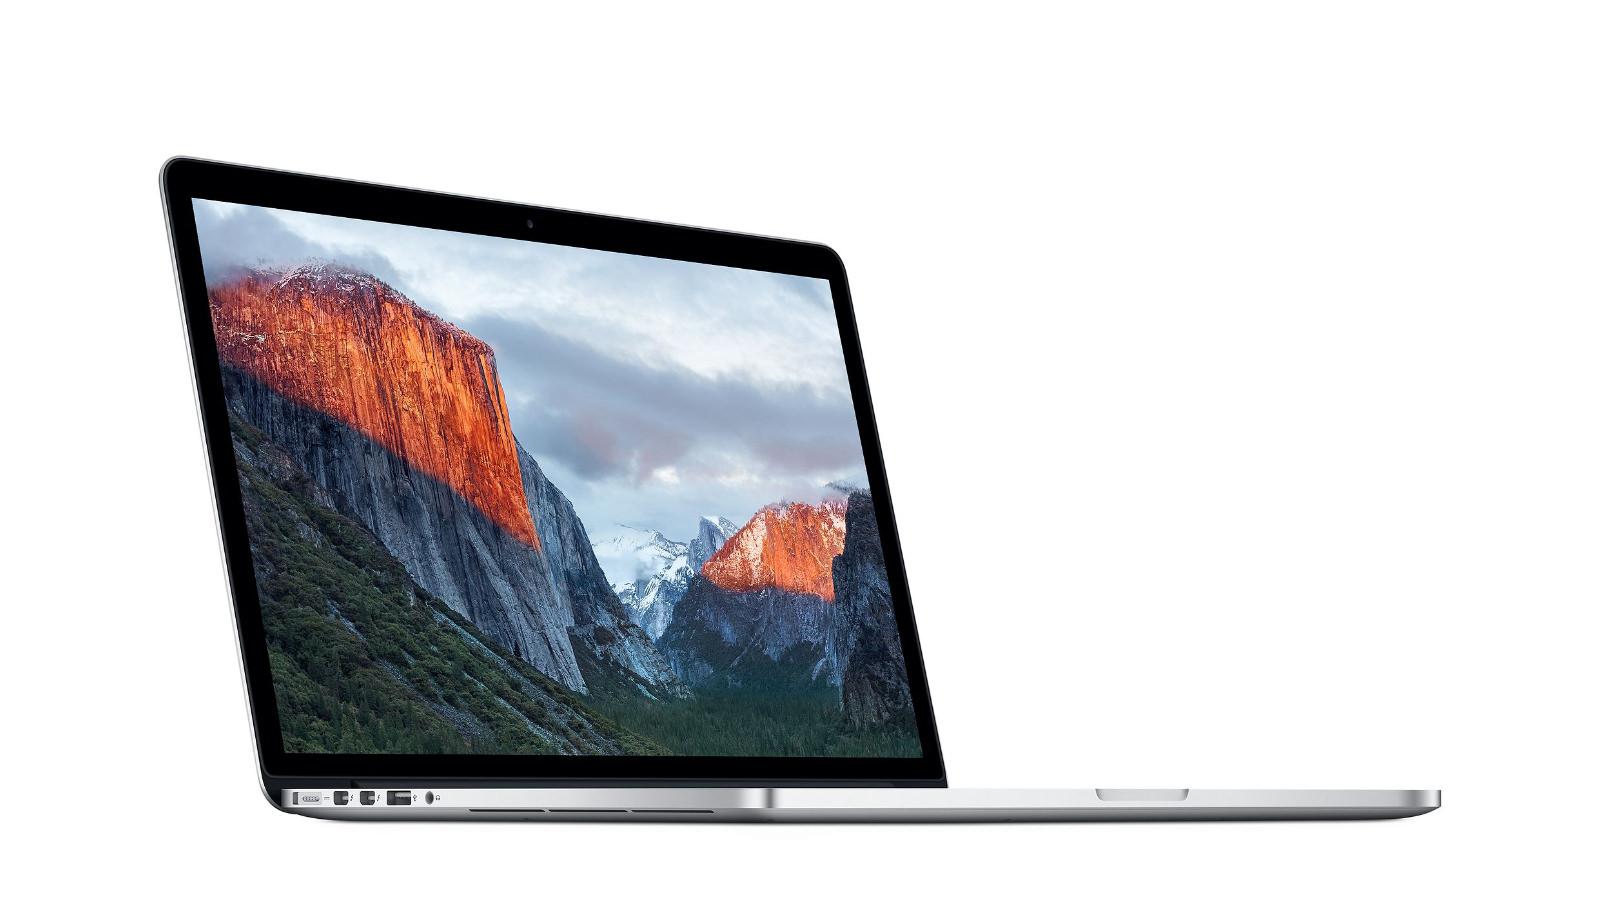 MacBook-Pro-2015-15inch-model.jpg